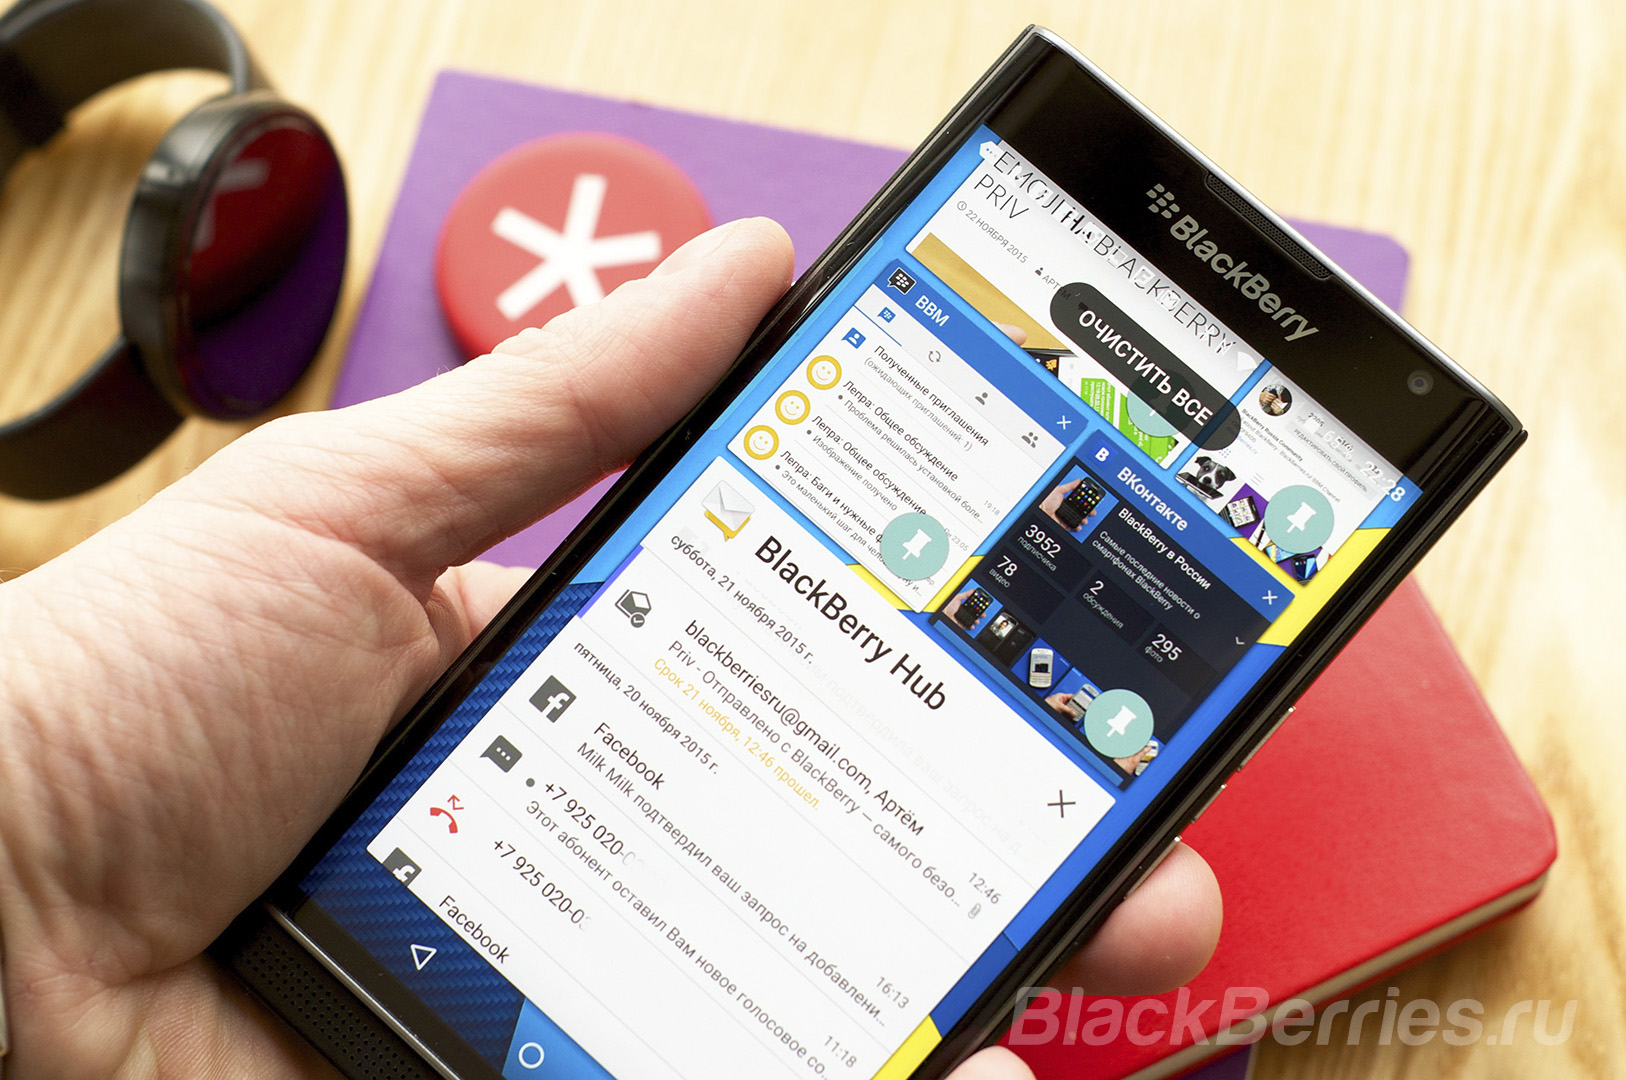 BlackBerry-Priv-23-11-09